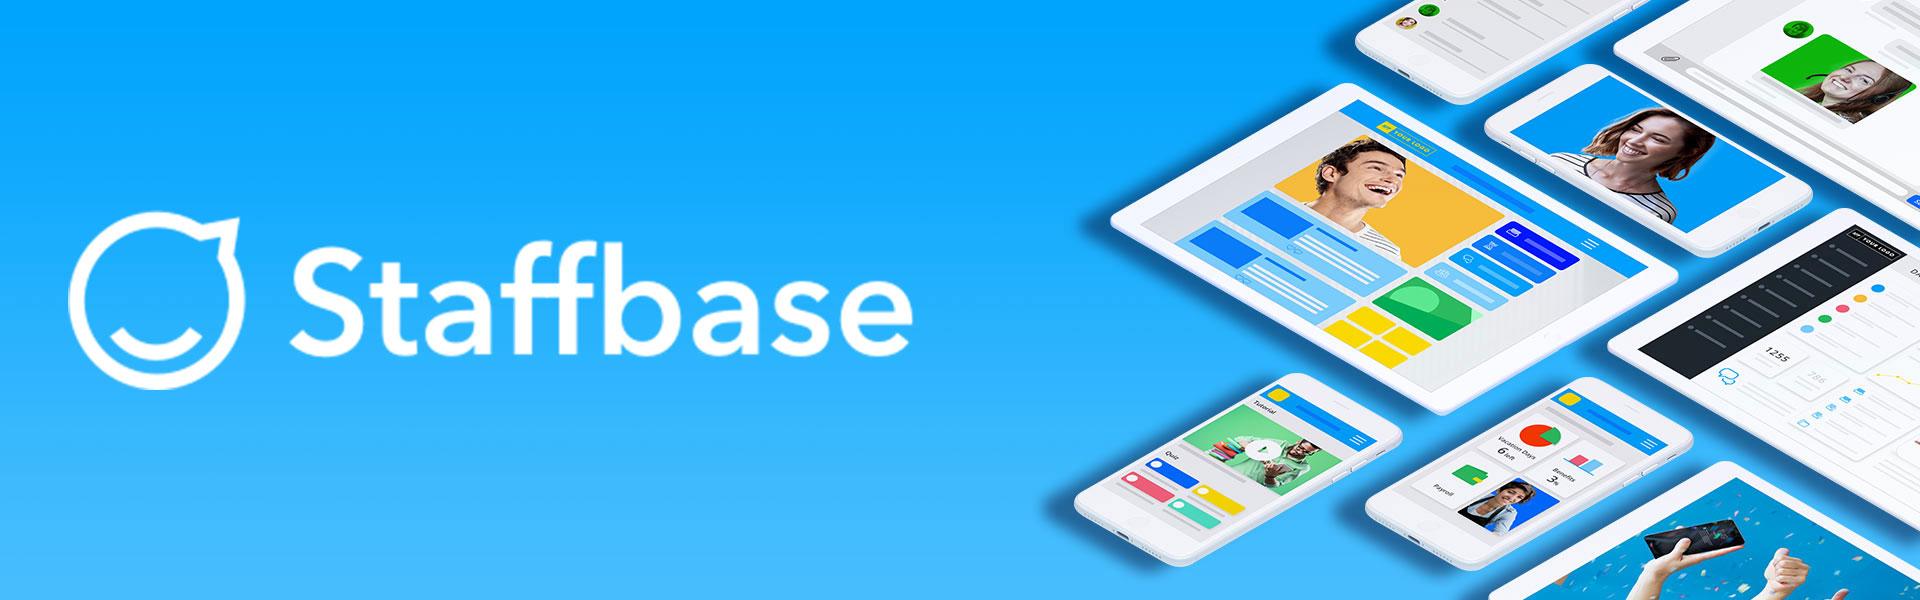 Staffbase Use Cases LINXYS GmbH